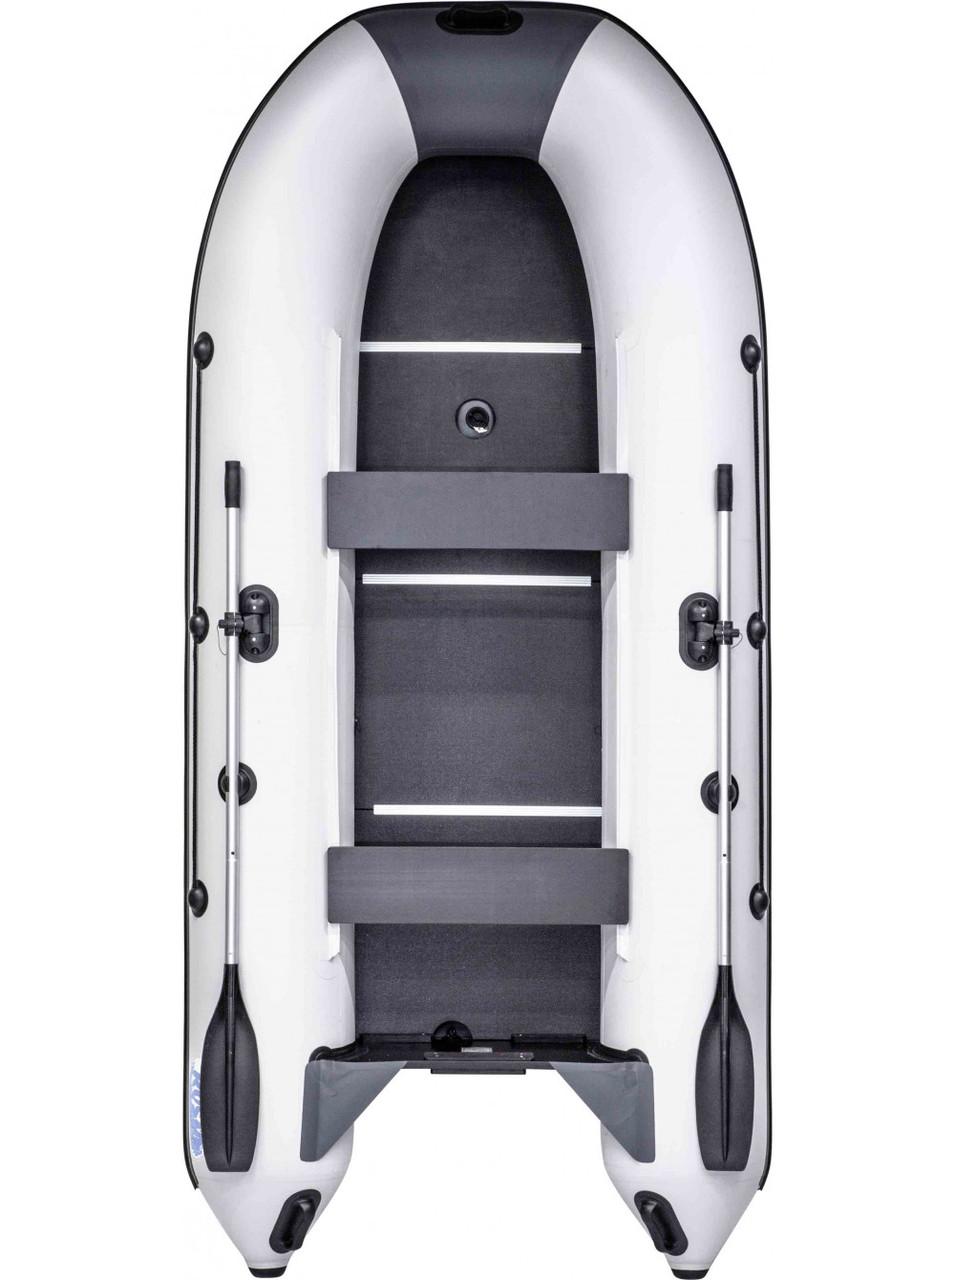 Лодка RUSH 3300 СК комби светло-серый/графит